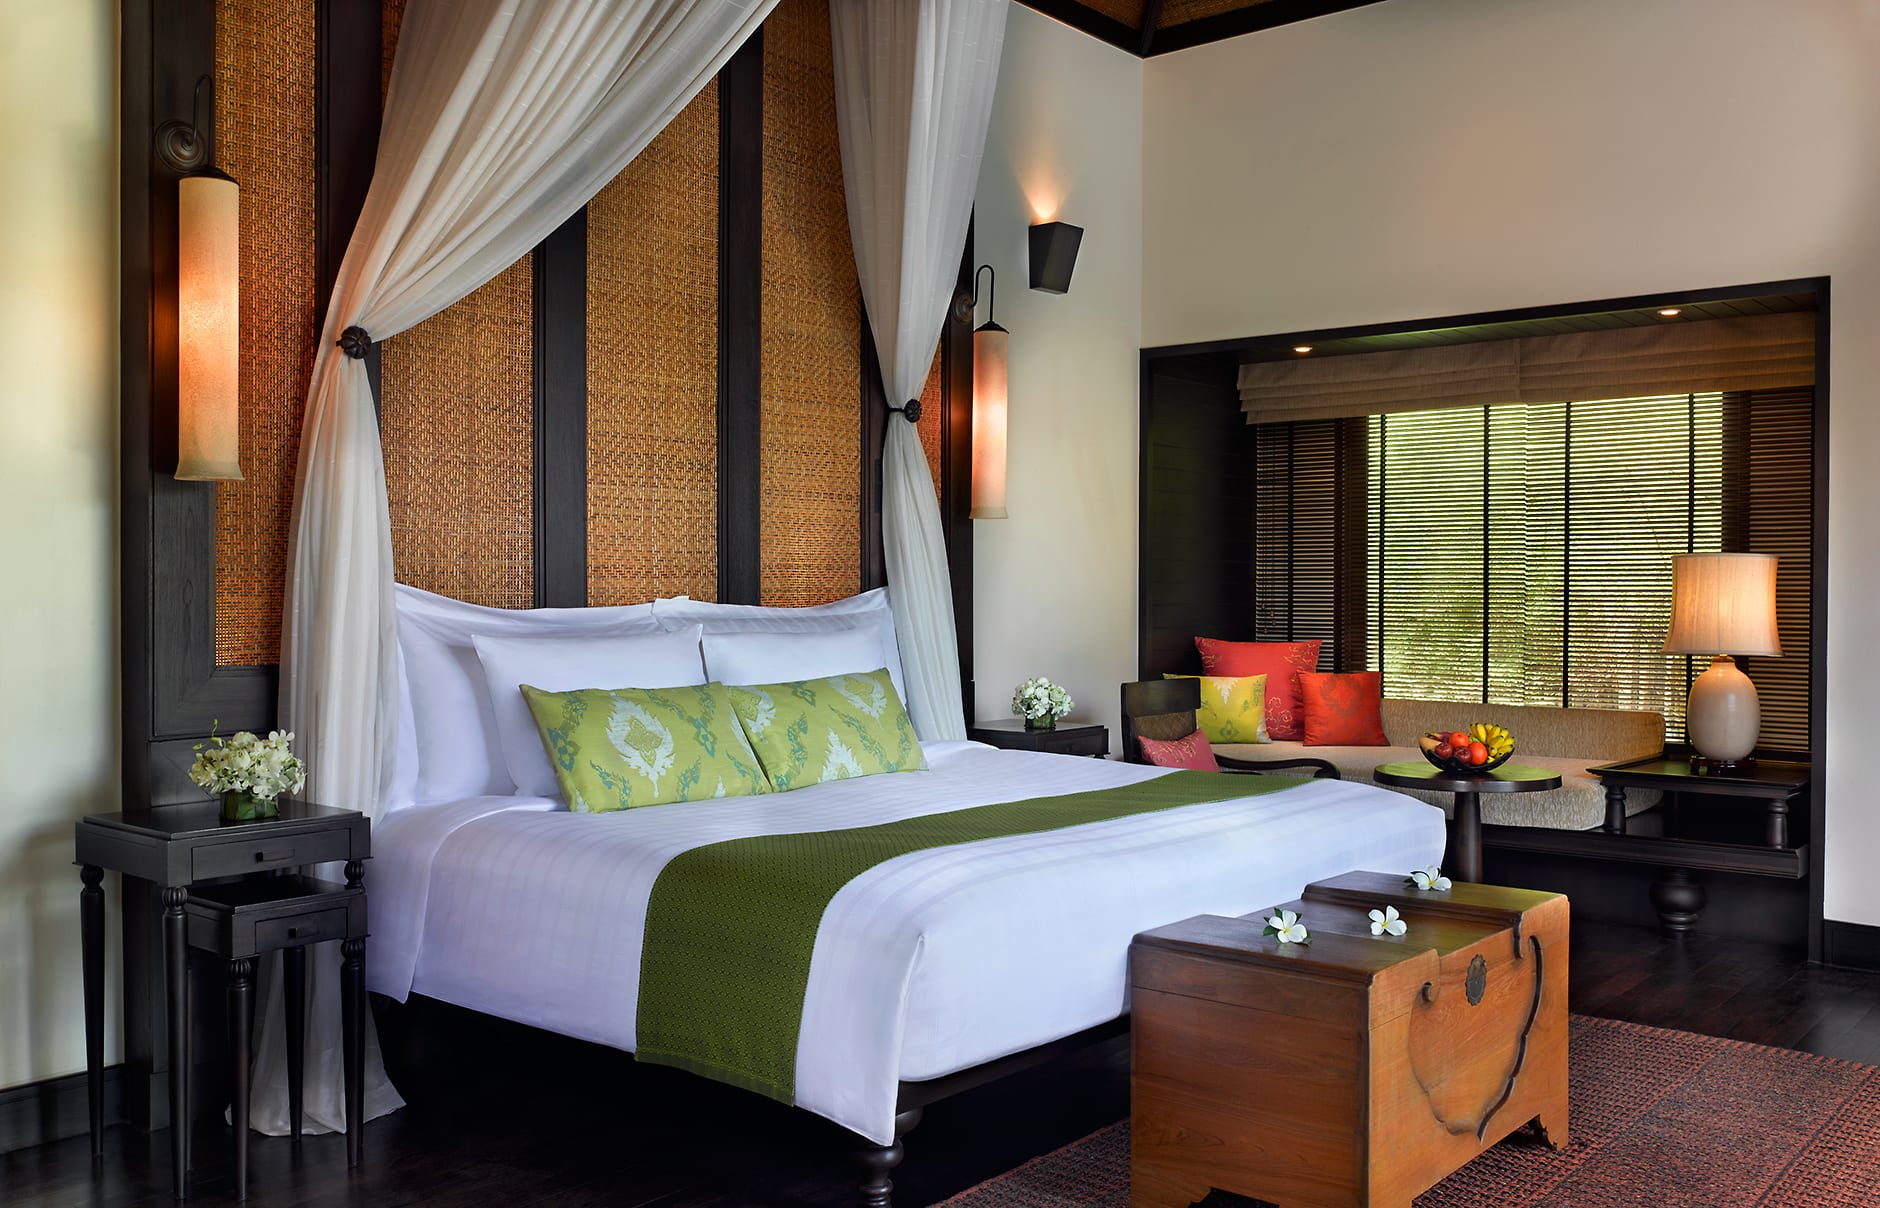 Pool Villa bedroom. Anantara Phuket Villas, Thailand. © Anantara Hotels, Resorts & Spa